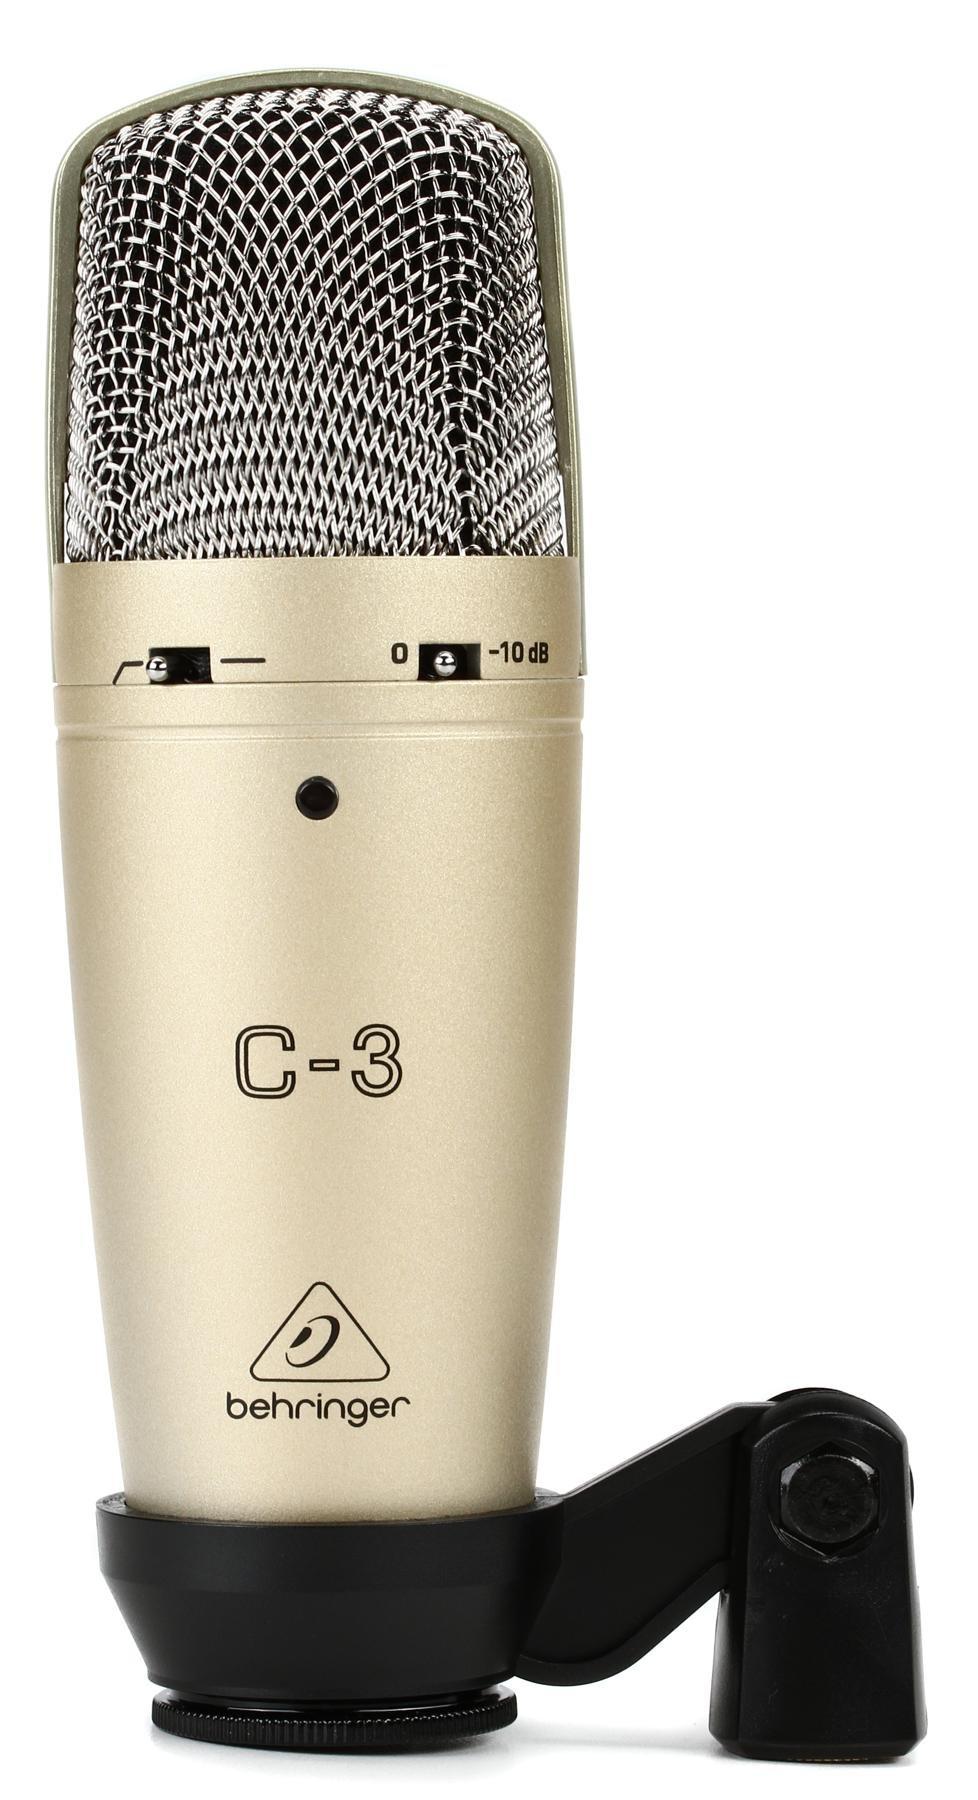 Behringer C 3 Dual Diaphragm Condenser Microphone Sweetwater Diagram Image 1